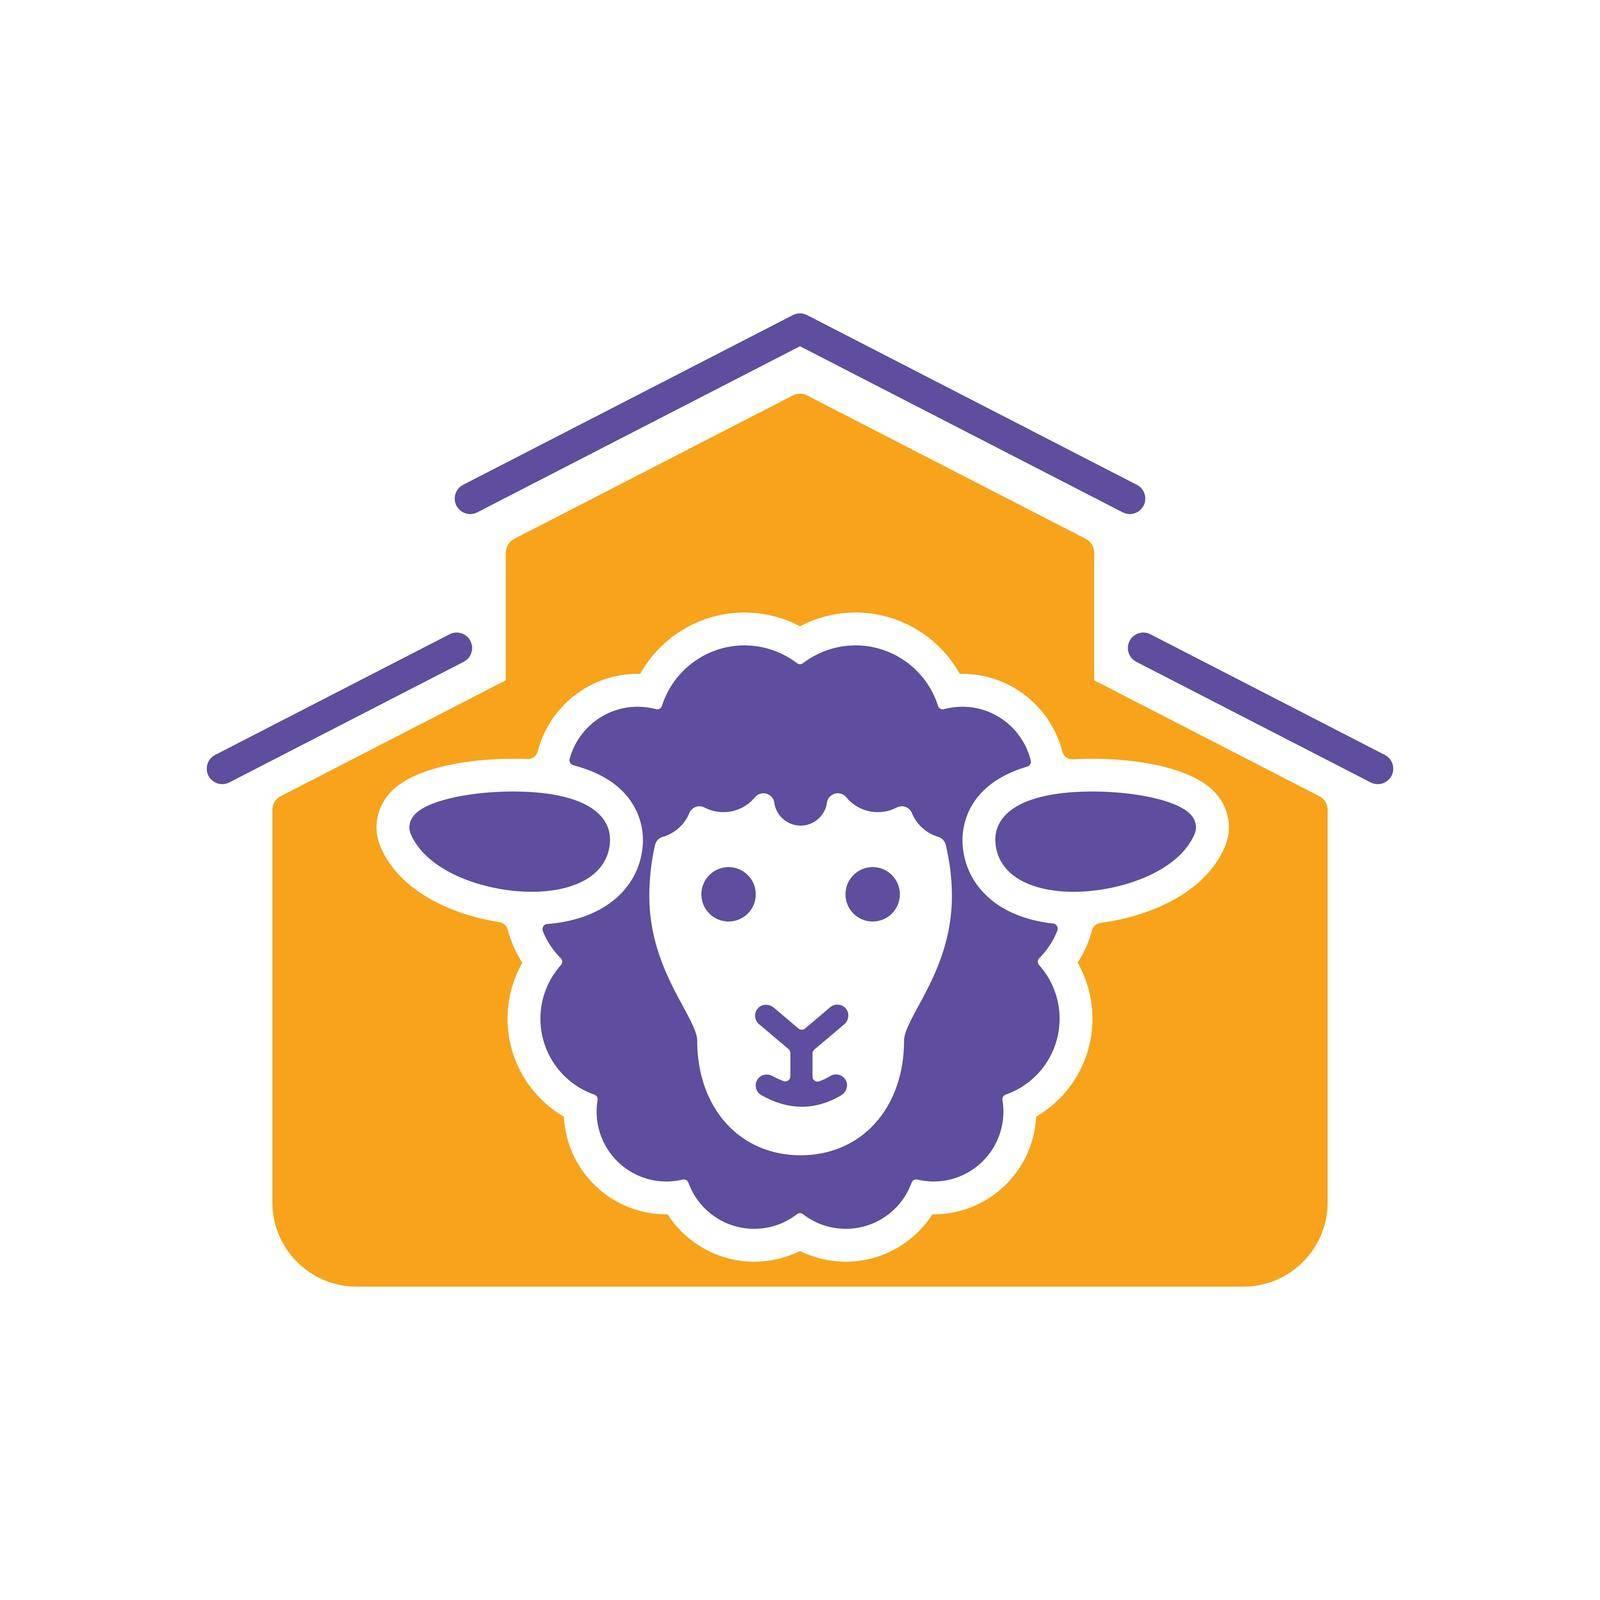 Sheep house glyph icon. Farm animal sign. Graph symbol for your web site design, logo, app, UI. Vector illustration